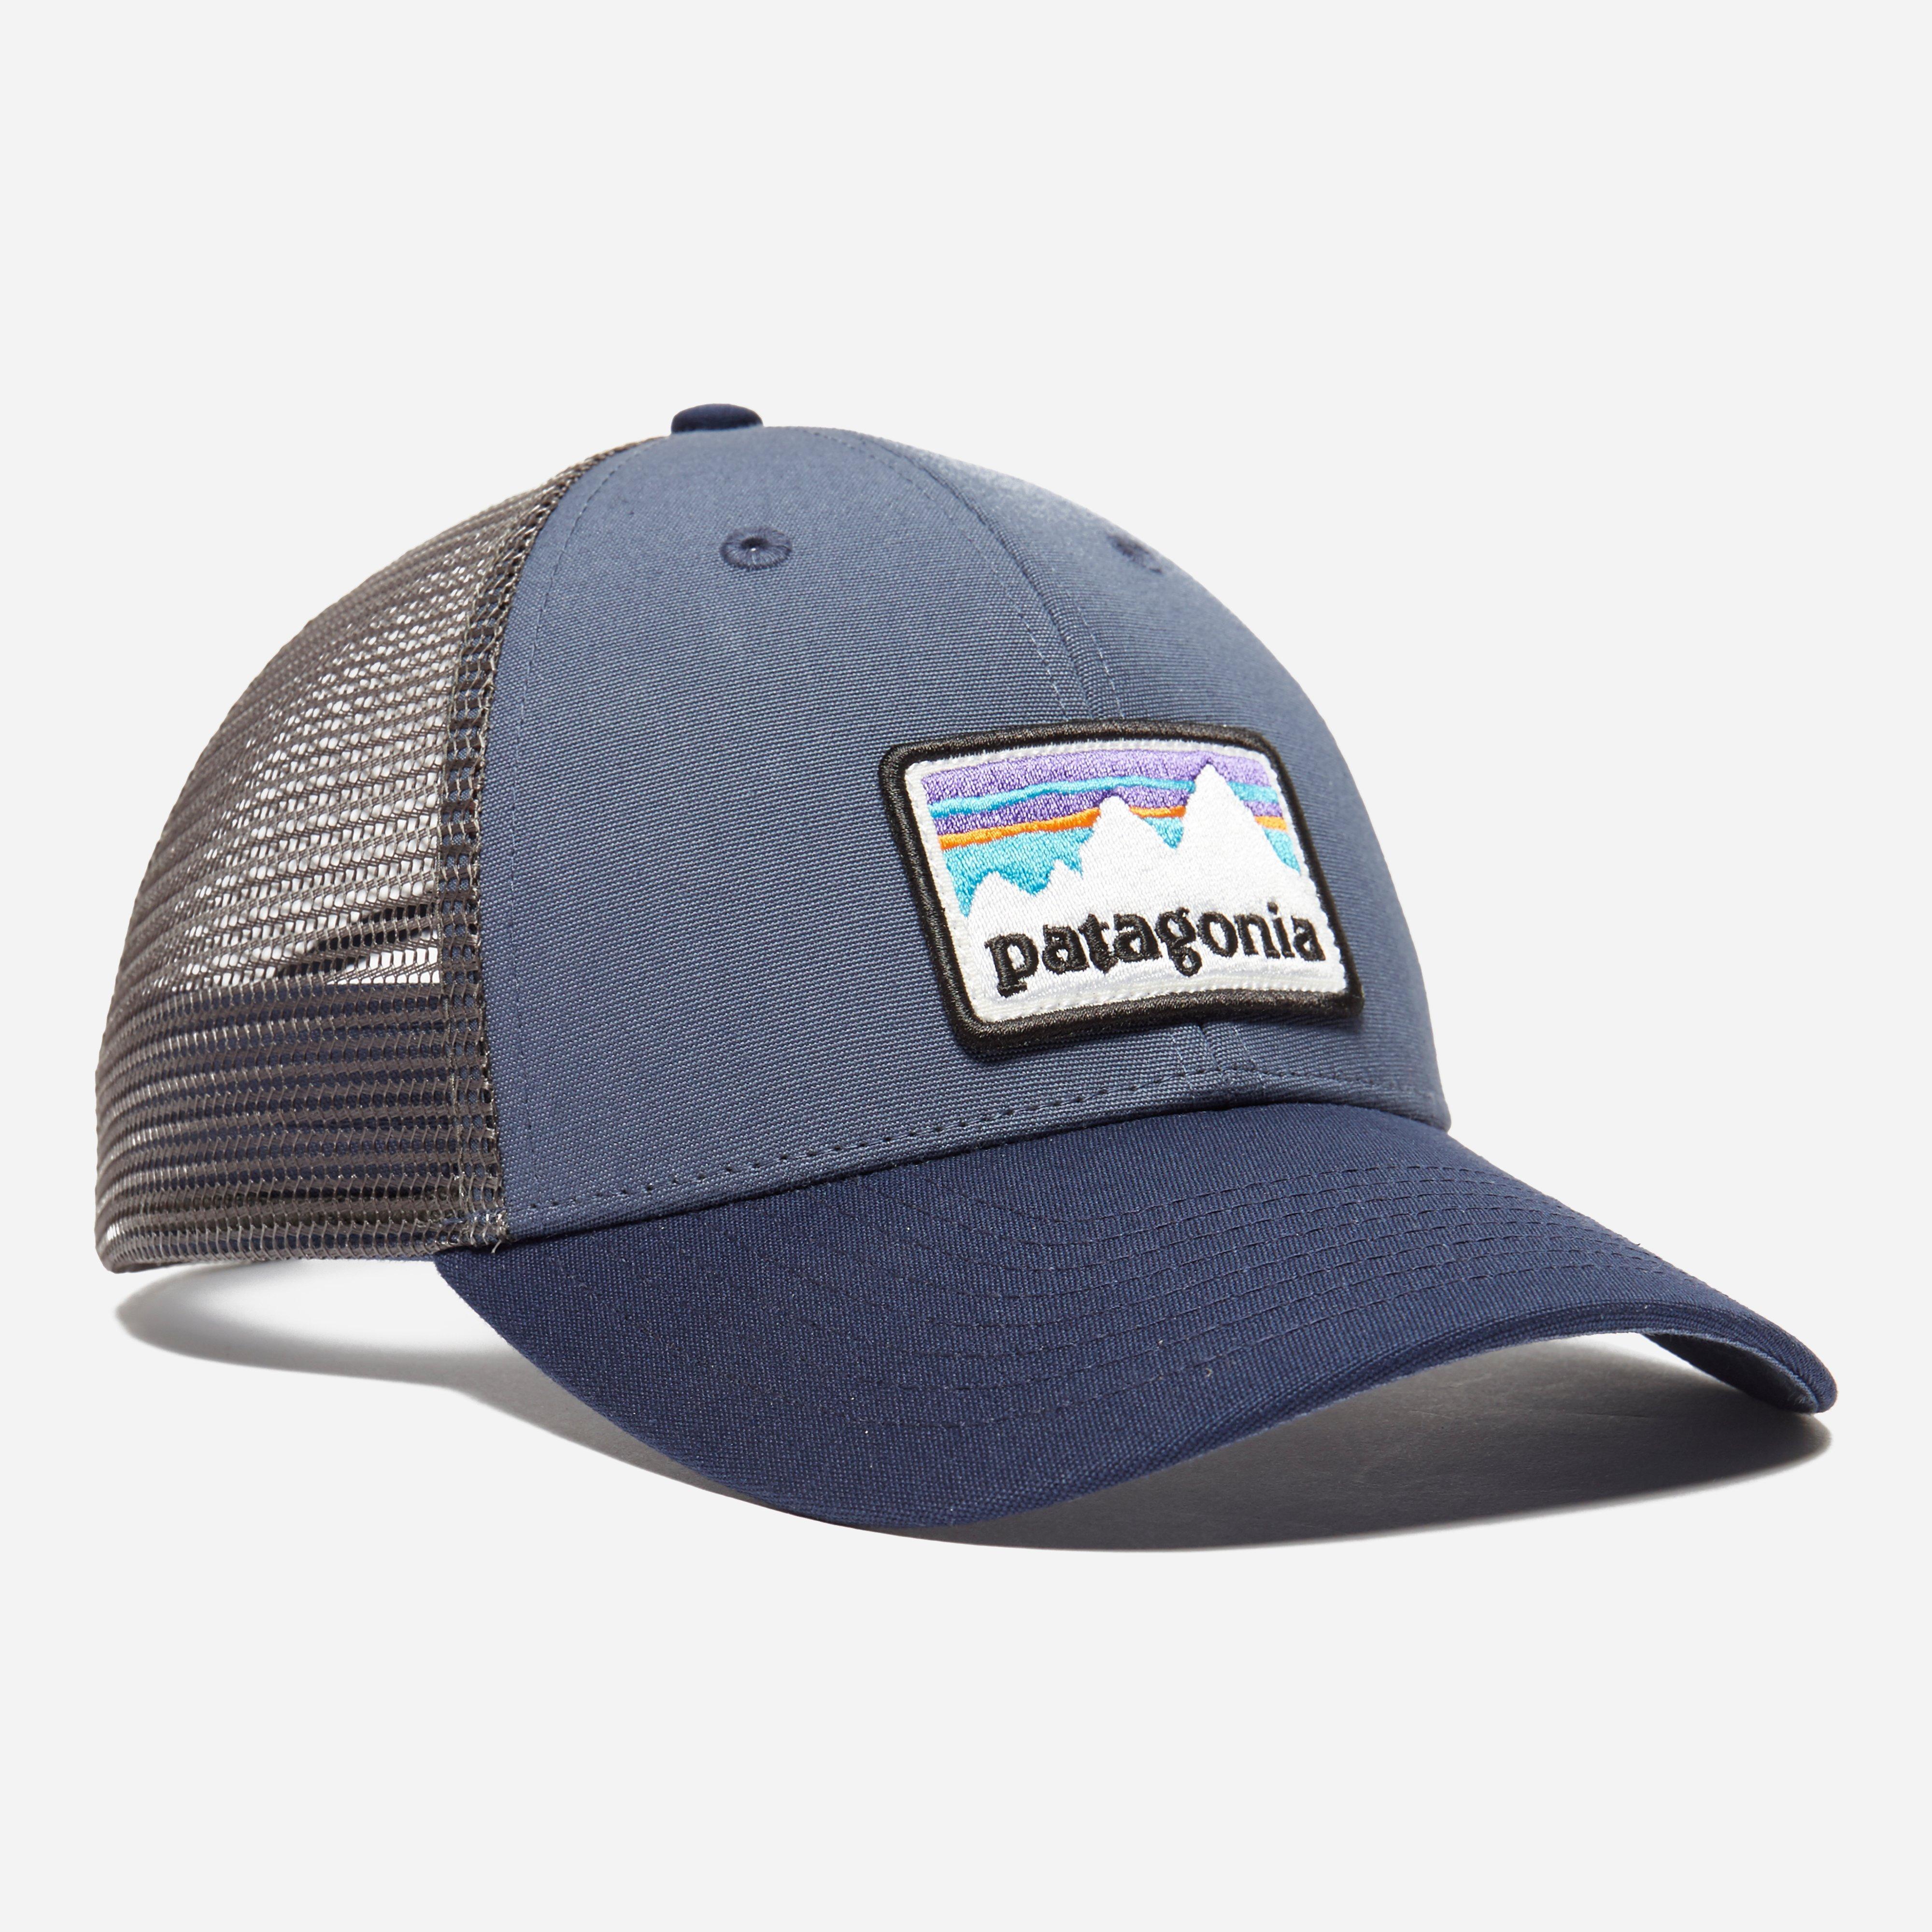 Patagonia Lo Pro Trucker Hat